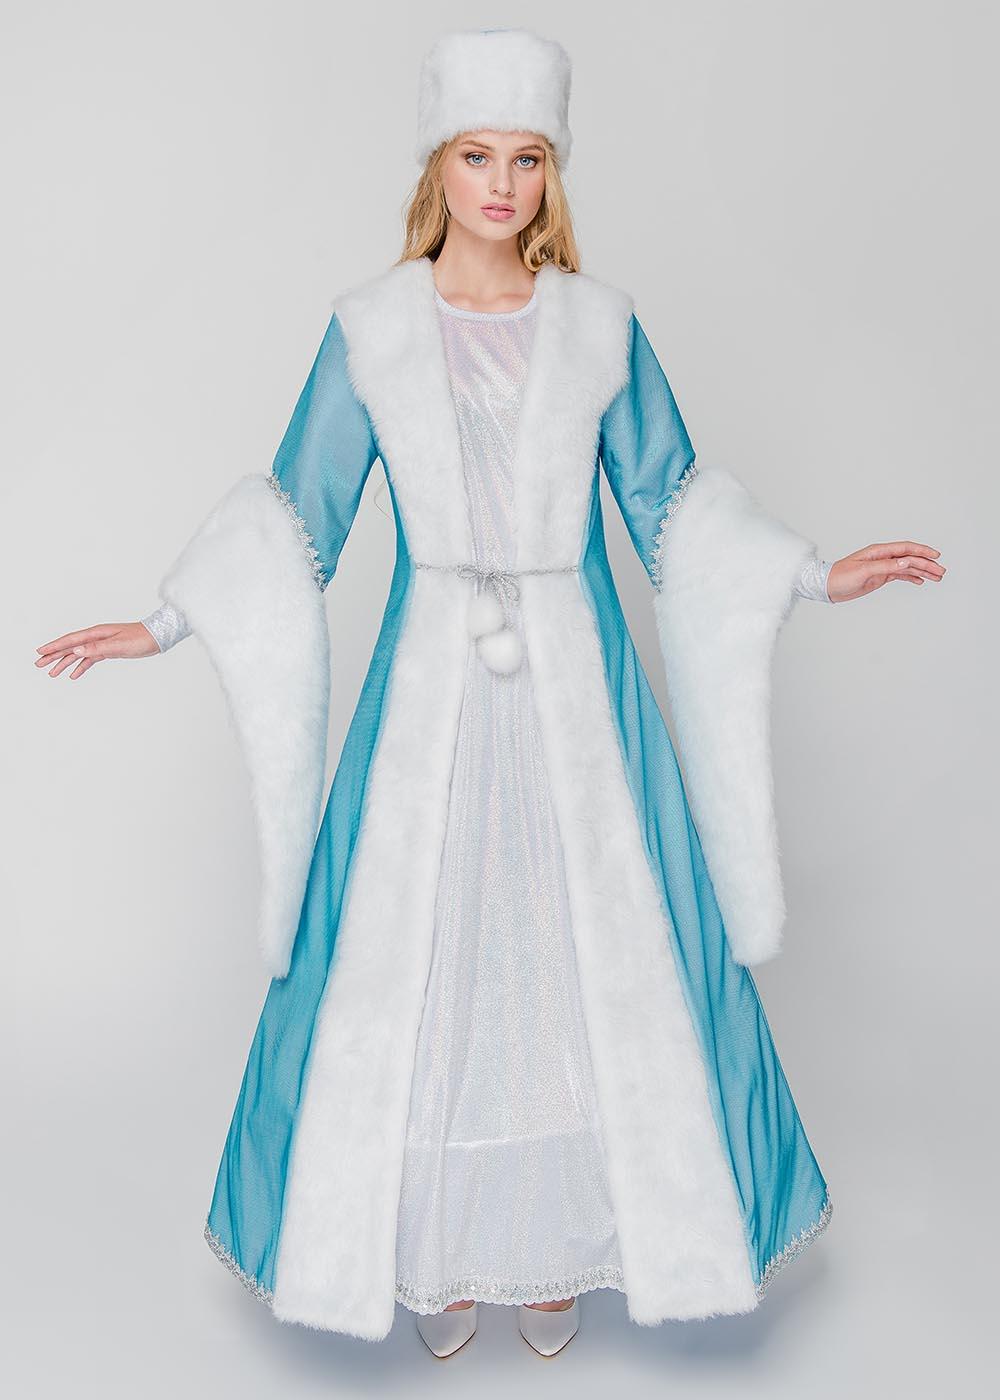 Костюм Снегурочки Арктика голубая